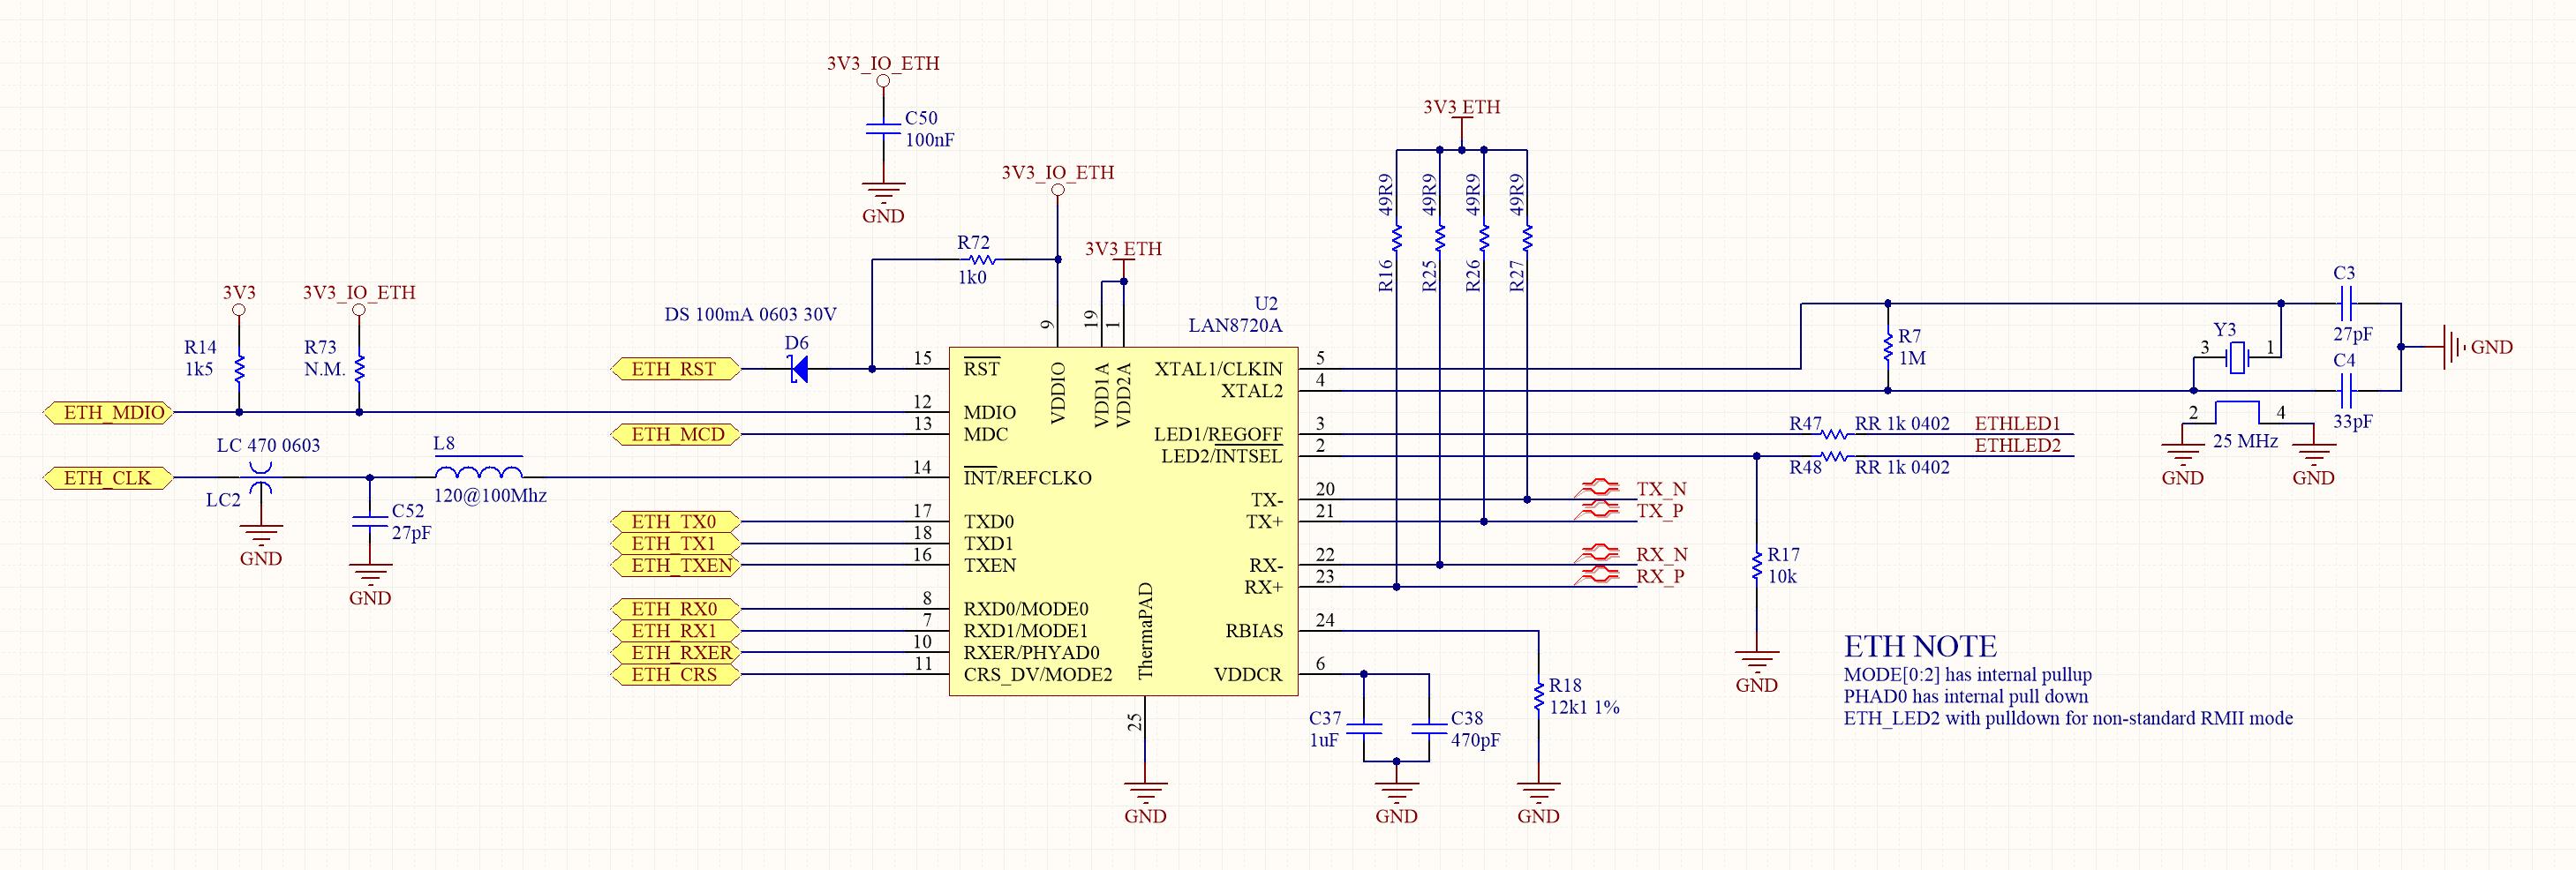 Phy Rj45 Schematic - Wiring Diagrams Hubs - Rj45 Wiring Diagram